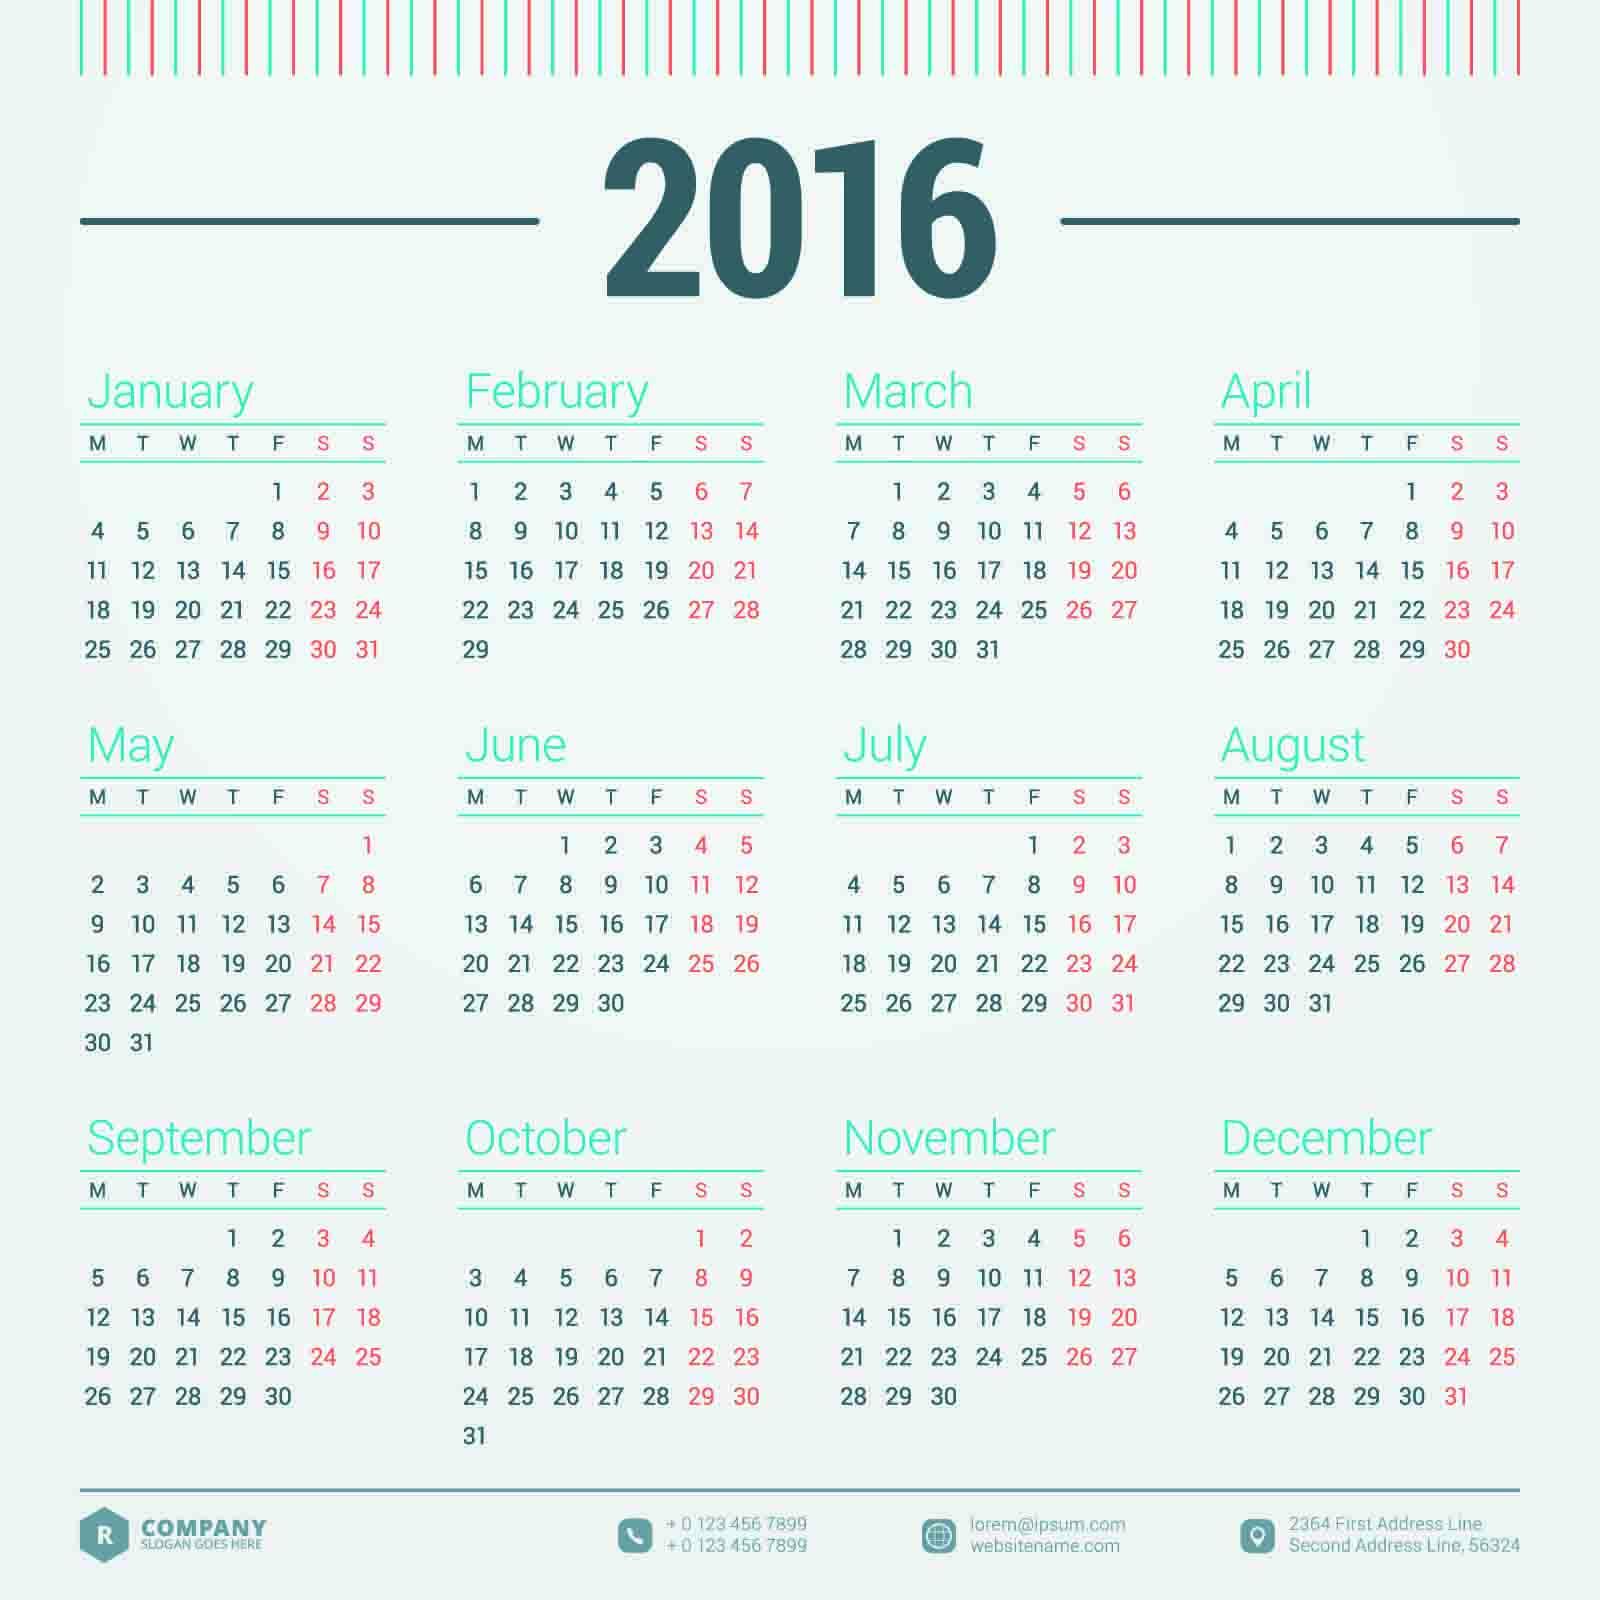 2016 Calendar : カレンダー ダウンロード 2015 : カレンダー